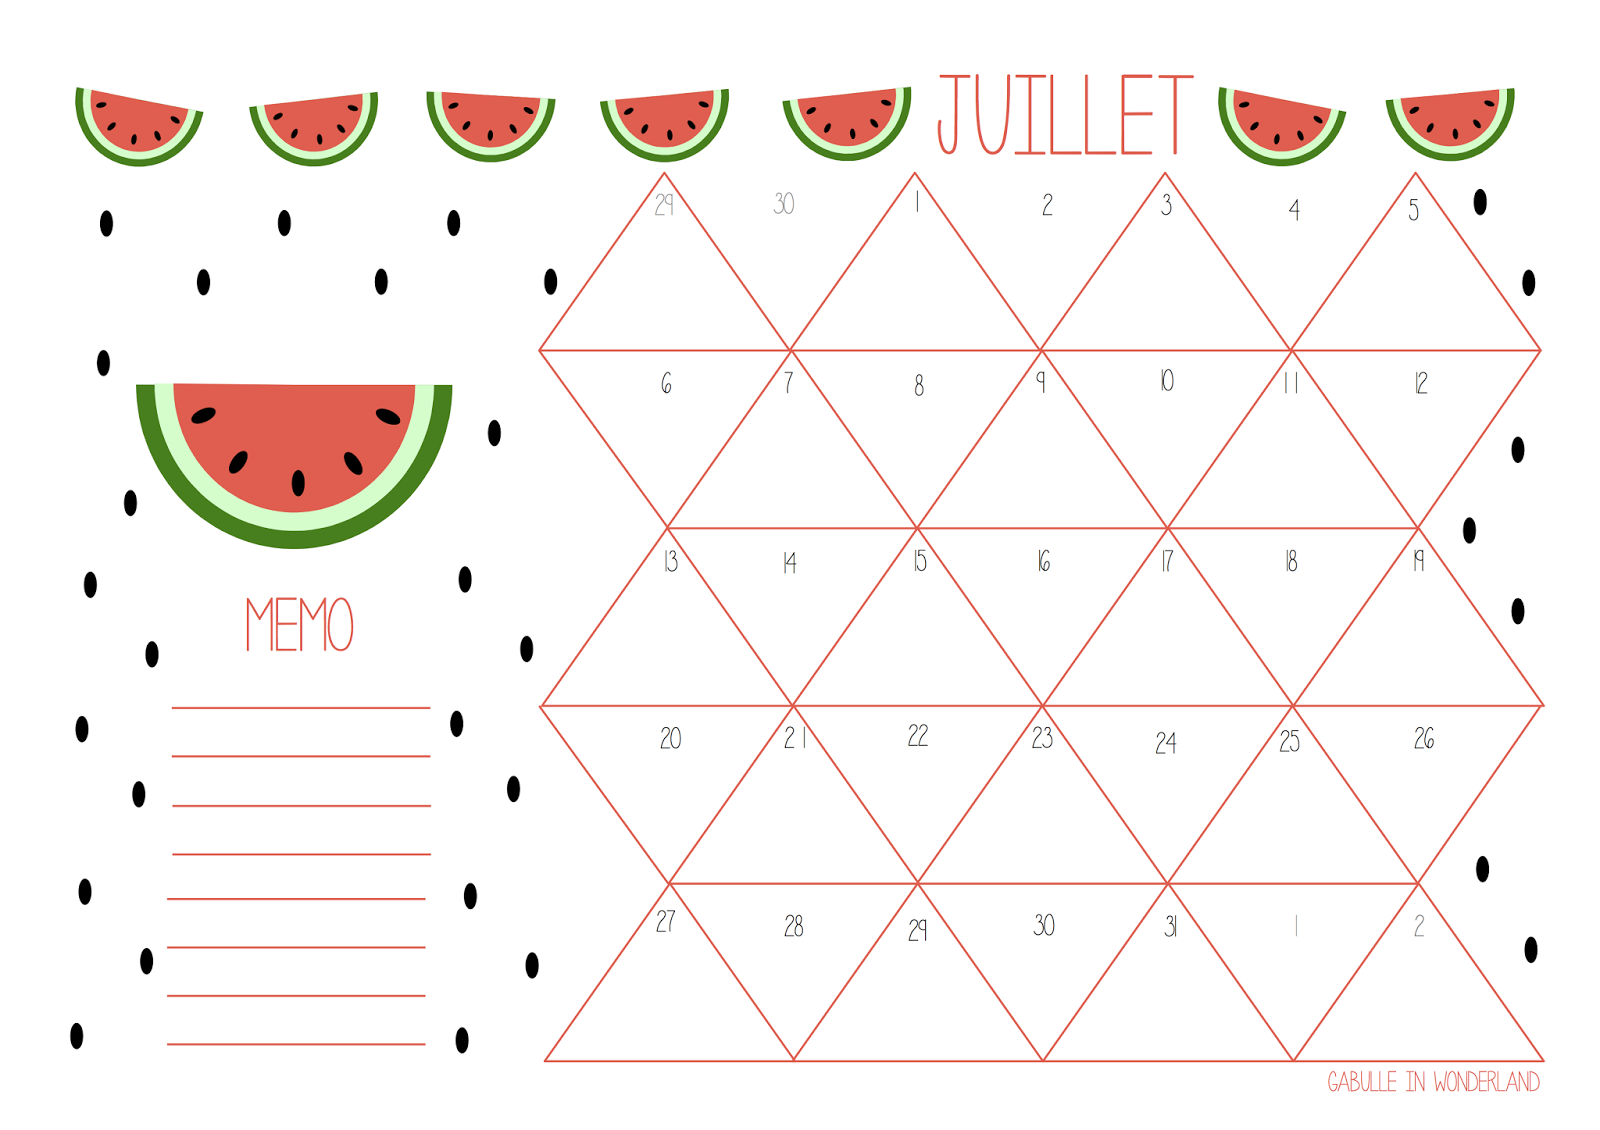 Gabulle in wonderland calendrier du mois de juillet for Calendrier jardin juin 2015